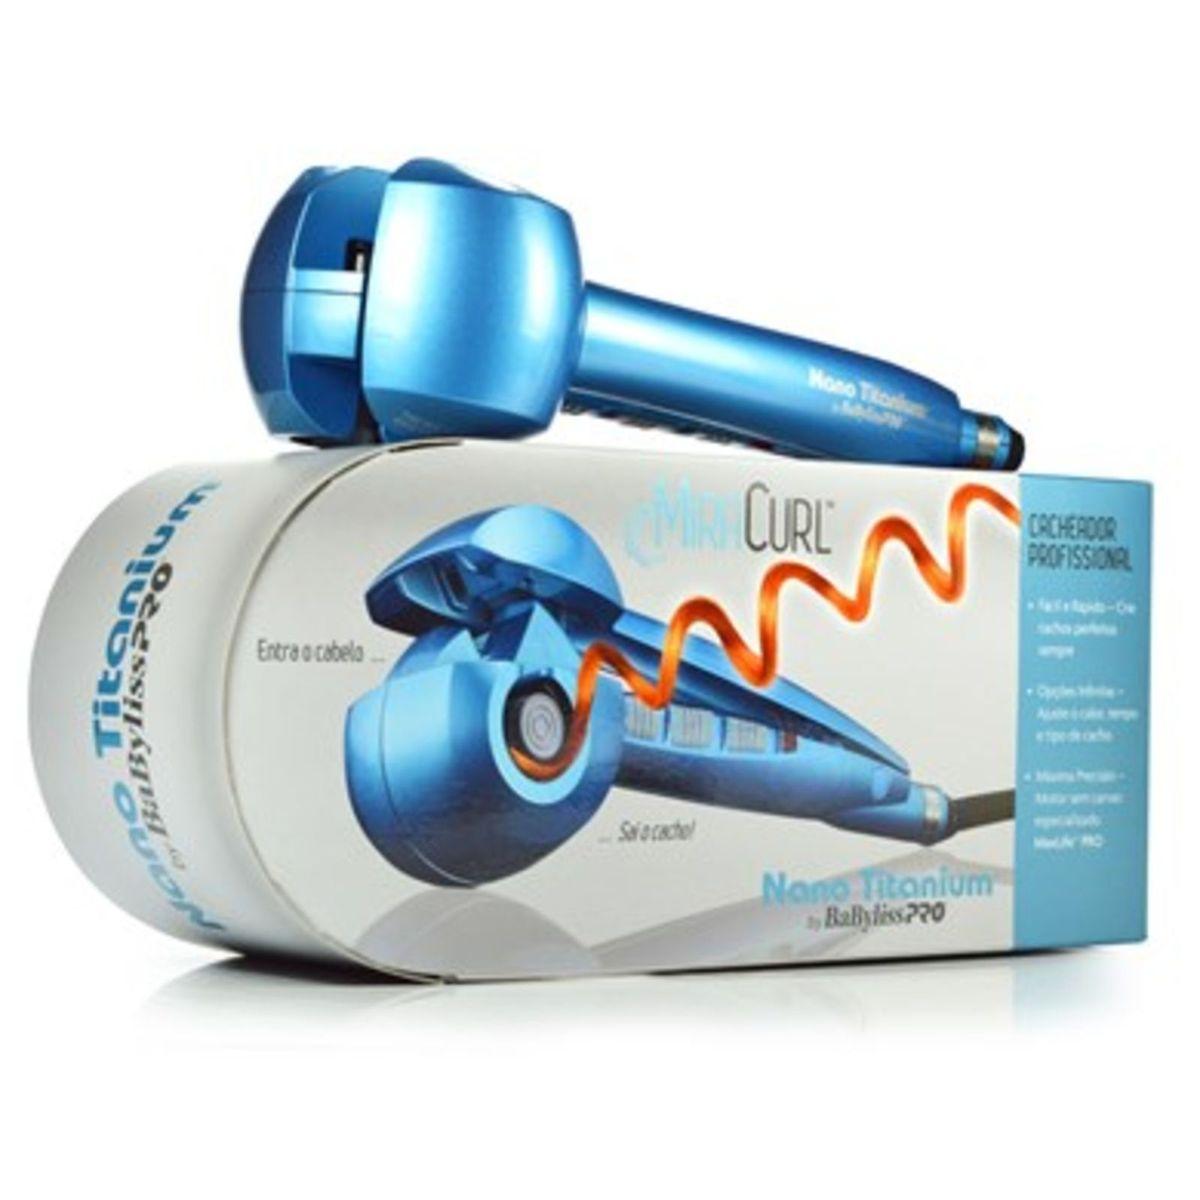 68a50414e Miracurl Babyliss Pro Nano Titanium Cacheador Profissional | Produto p/  Cabelos Feminino Babyliss Pro Nunca Usado 2212496 | enjoei